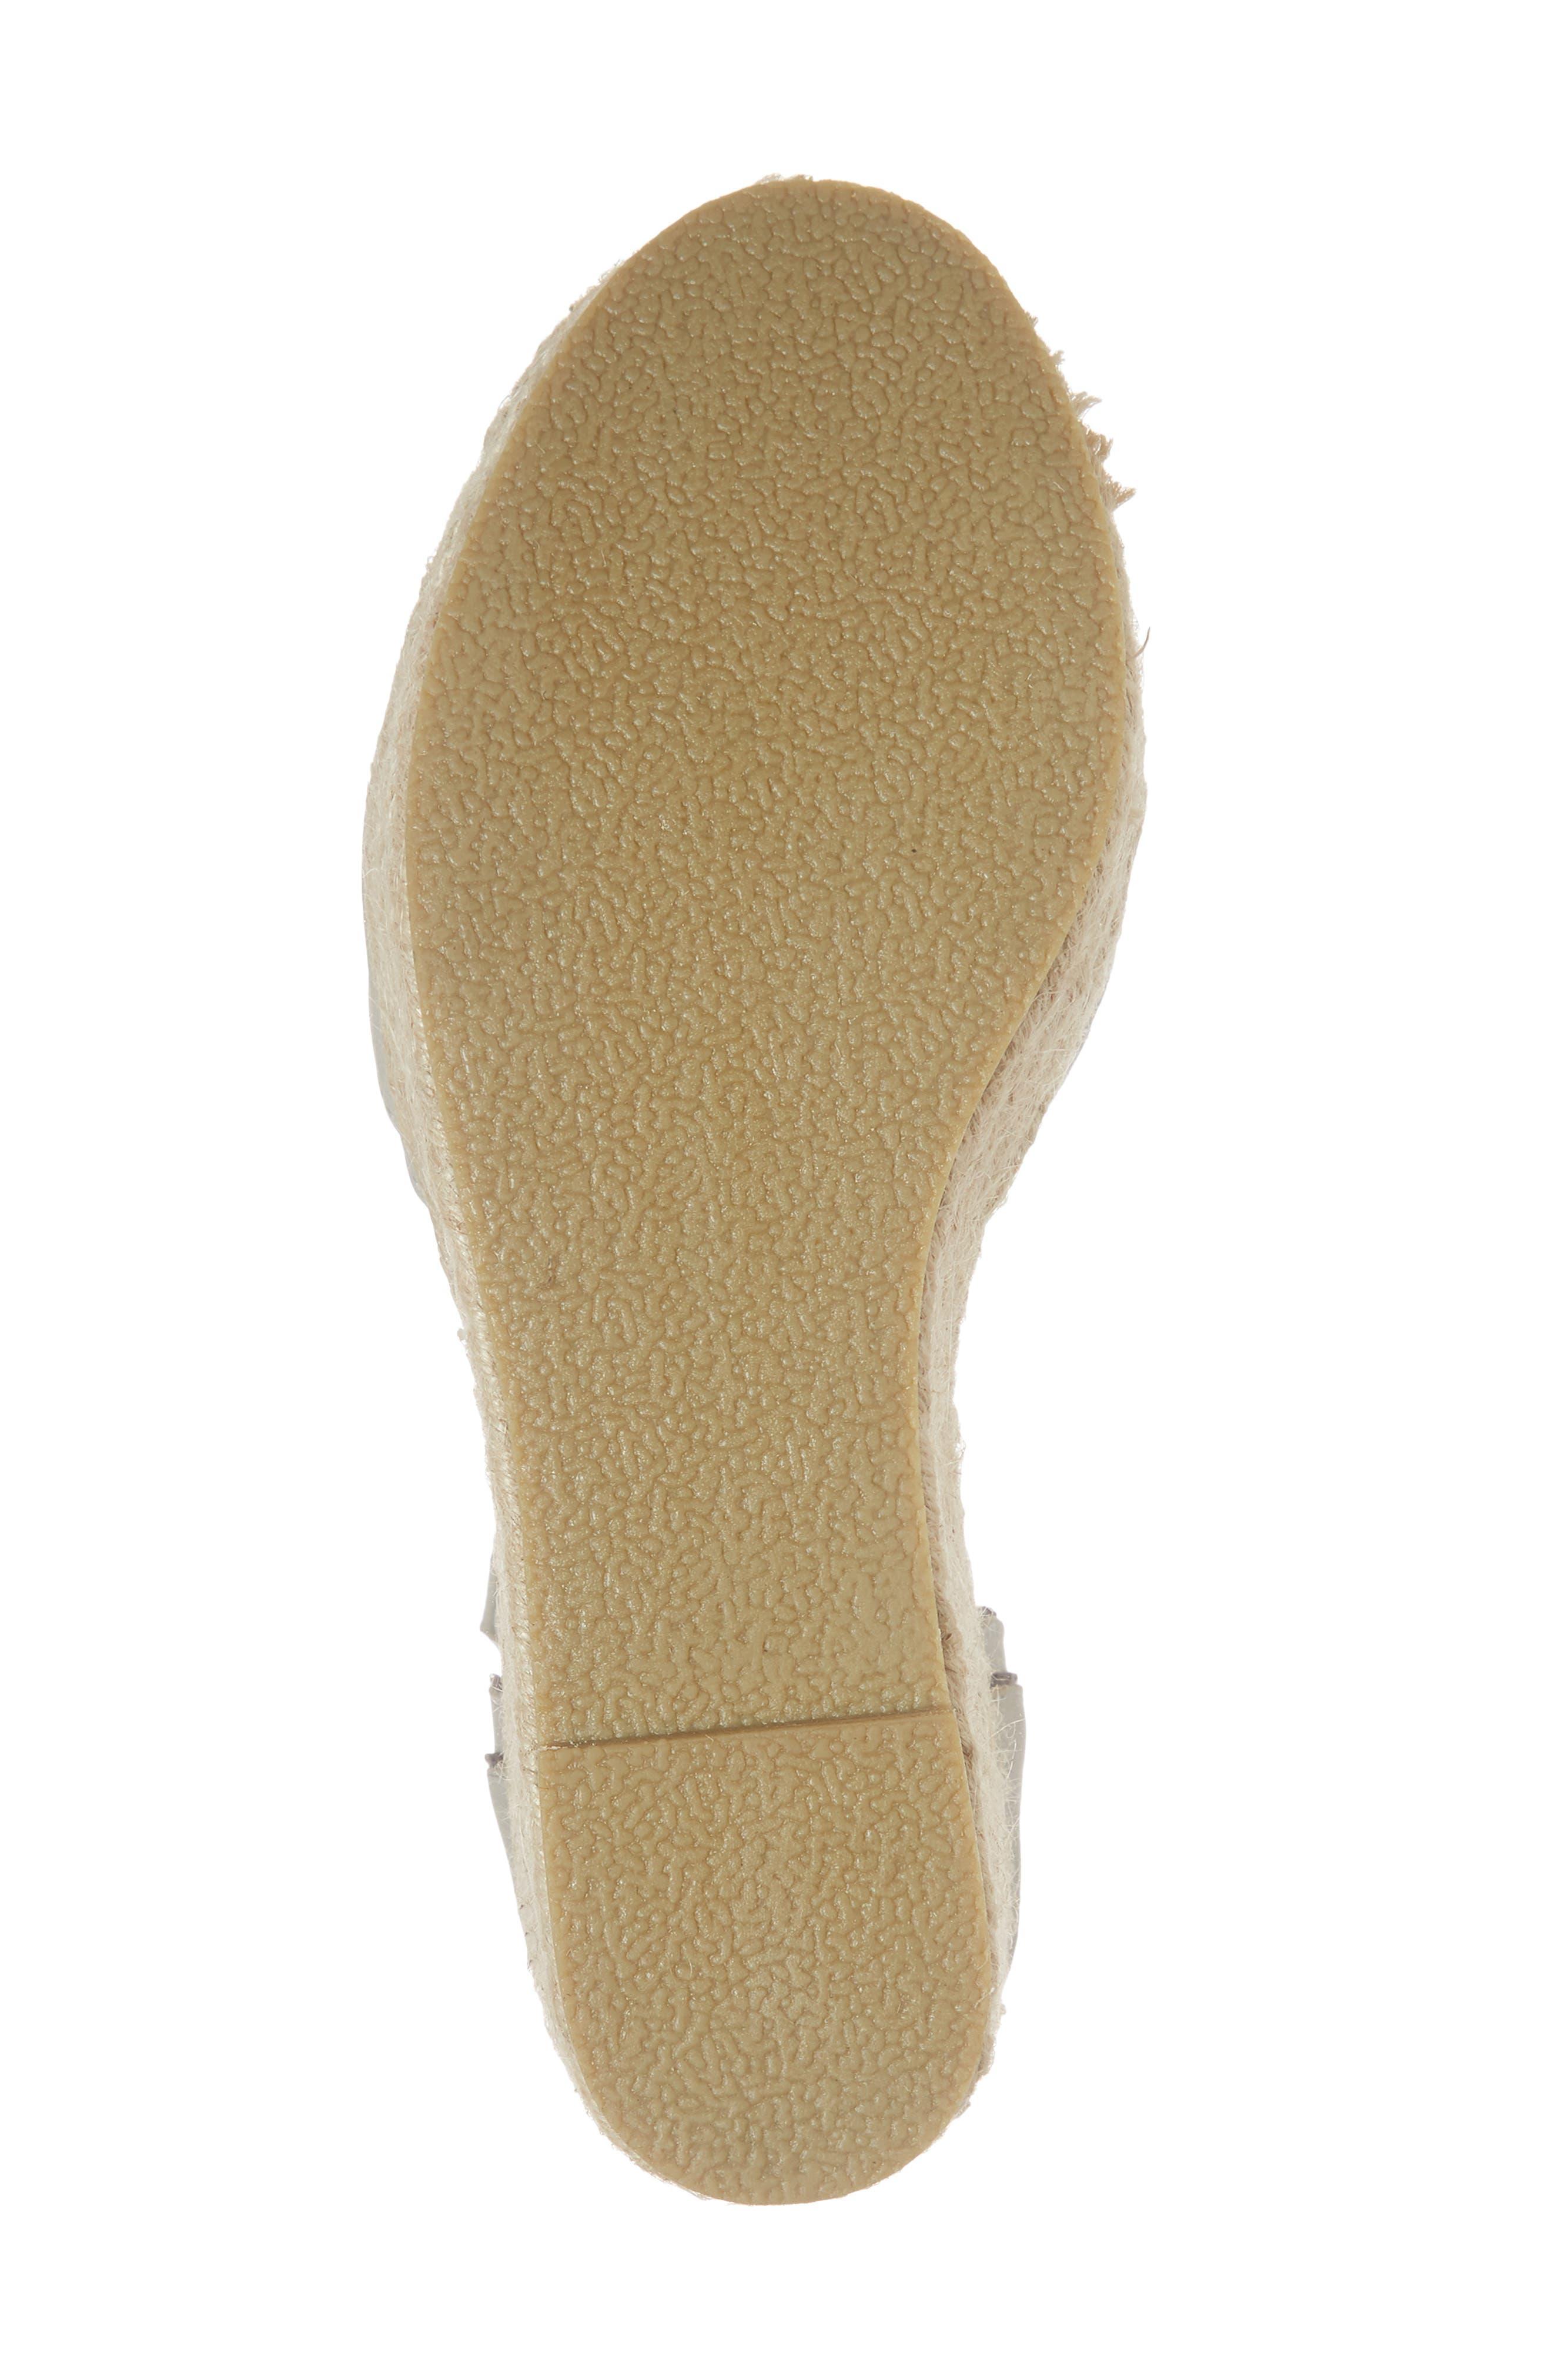 Bon Voyage Espadrille Wedge Sandal,                             Alternate thumbnail 6, color,                             Grey Fabric